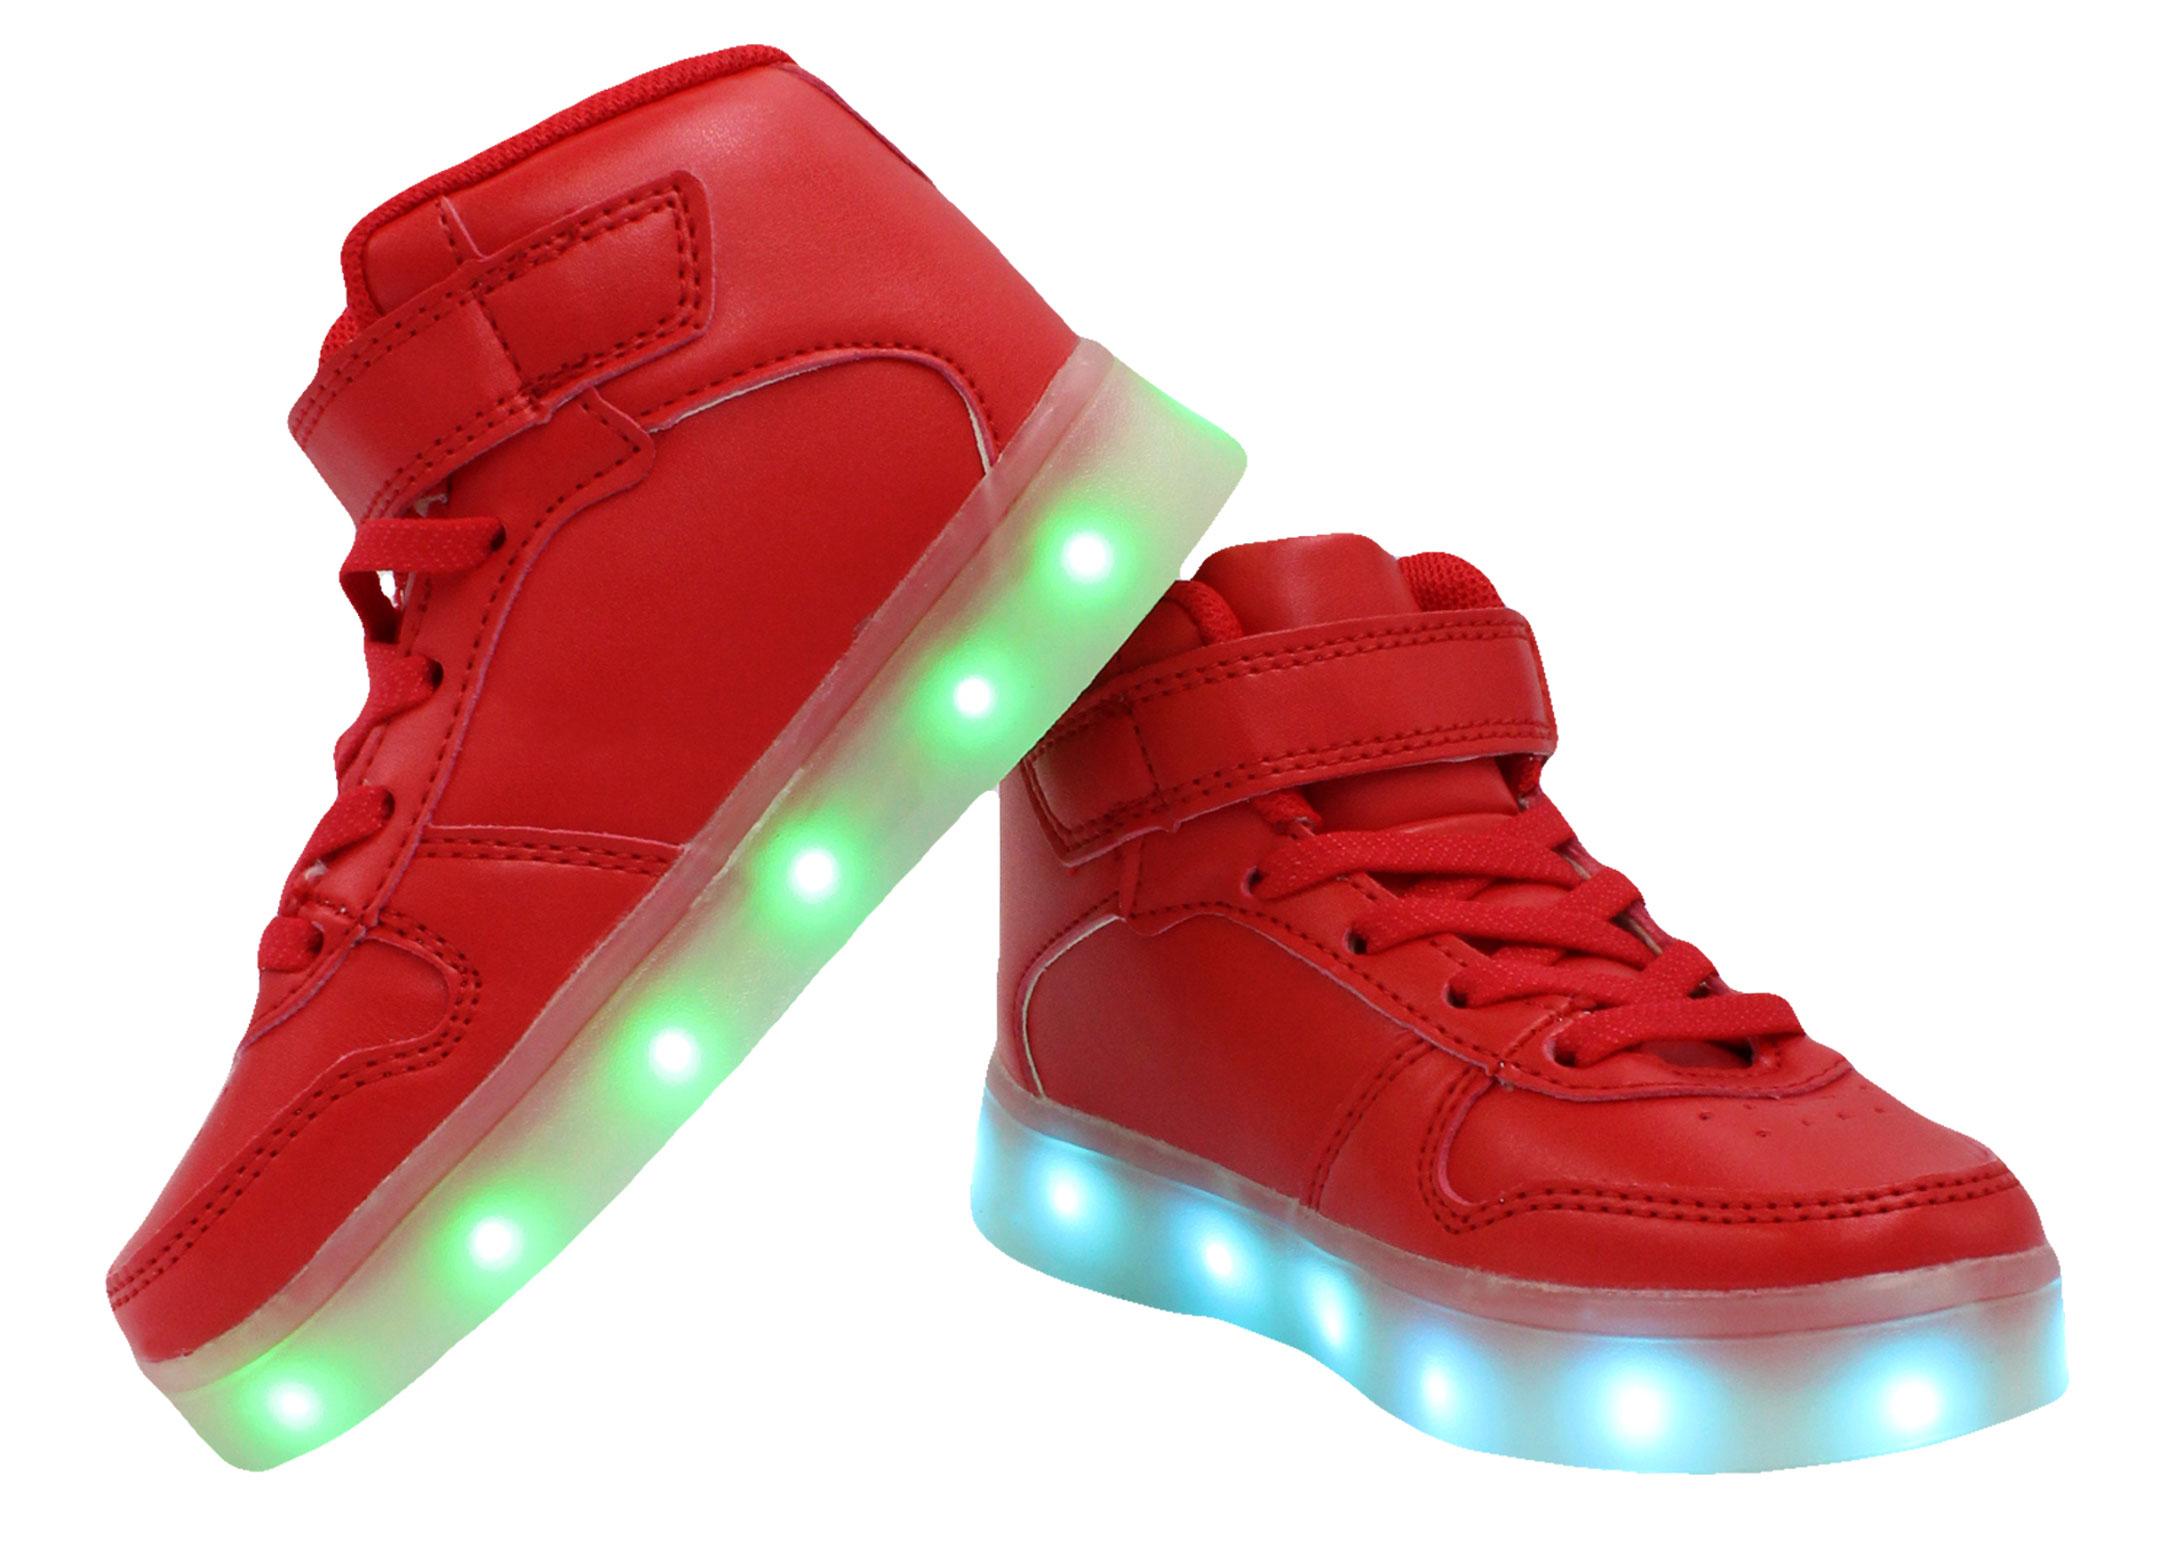 30482afd5c8 Galaxy Shoes - Galaxy LED Shoes Light Up USB Charging High Top Kids Sneakers  (Black) - Walmart.com